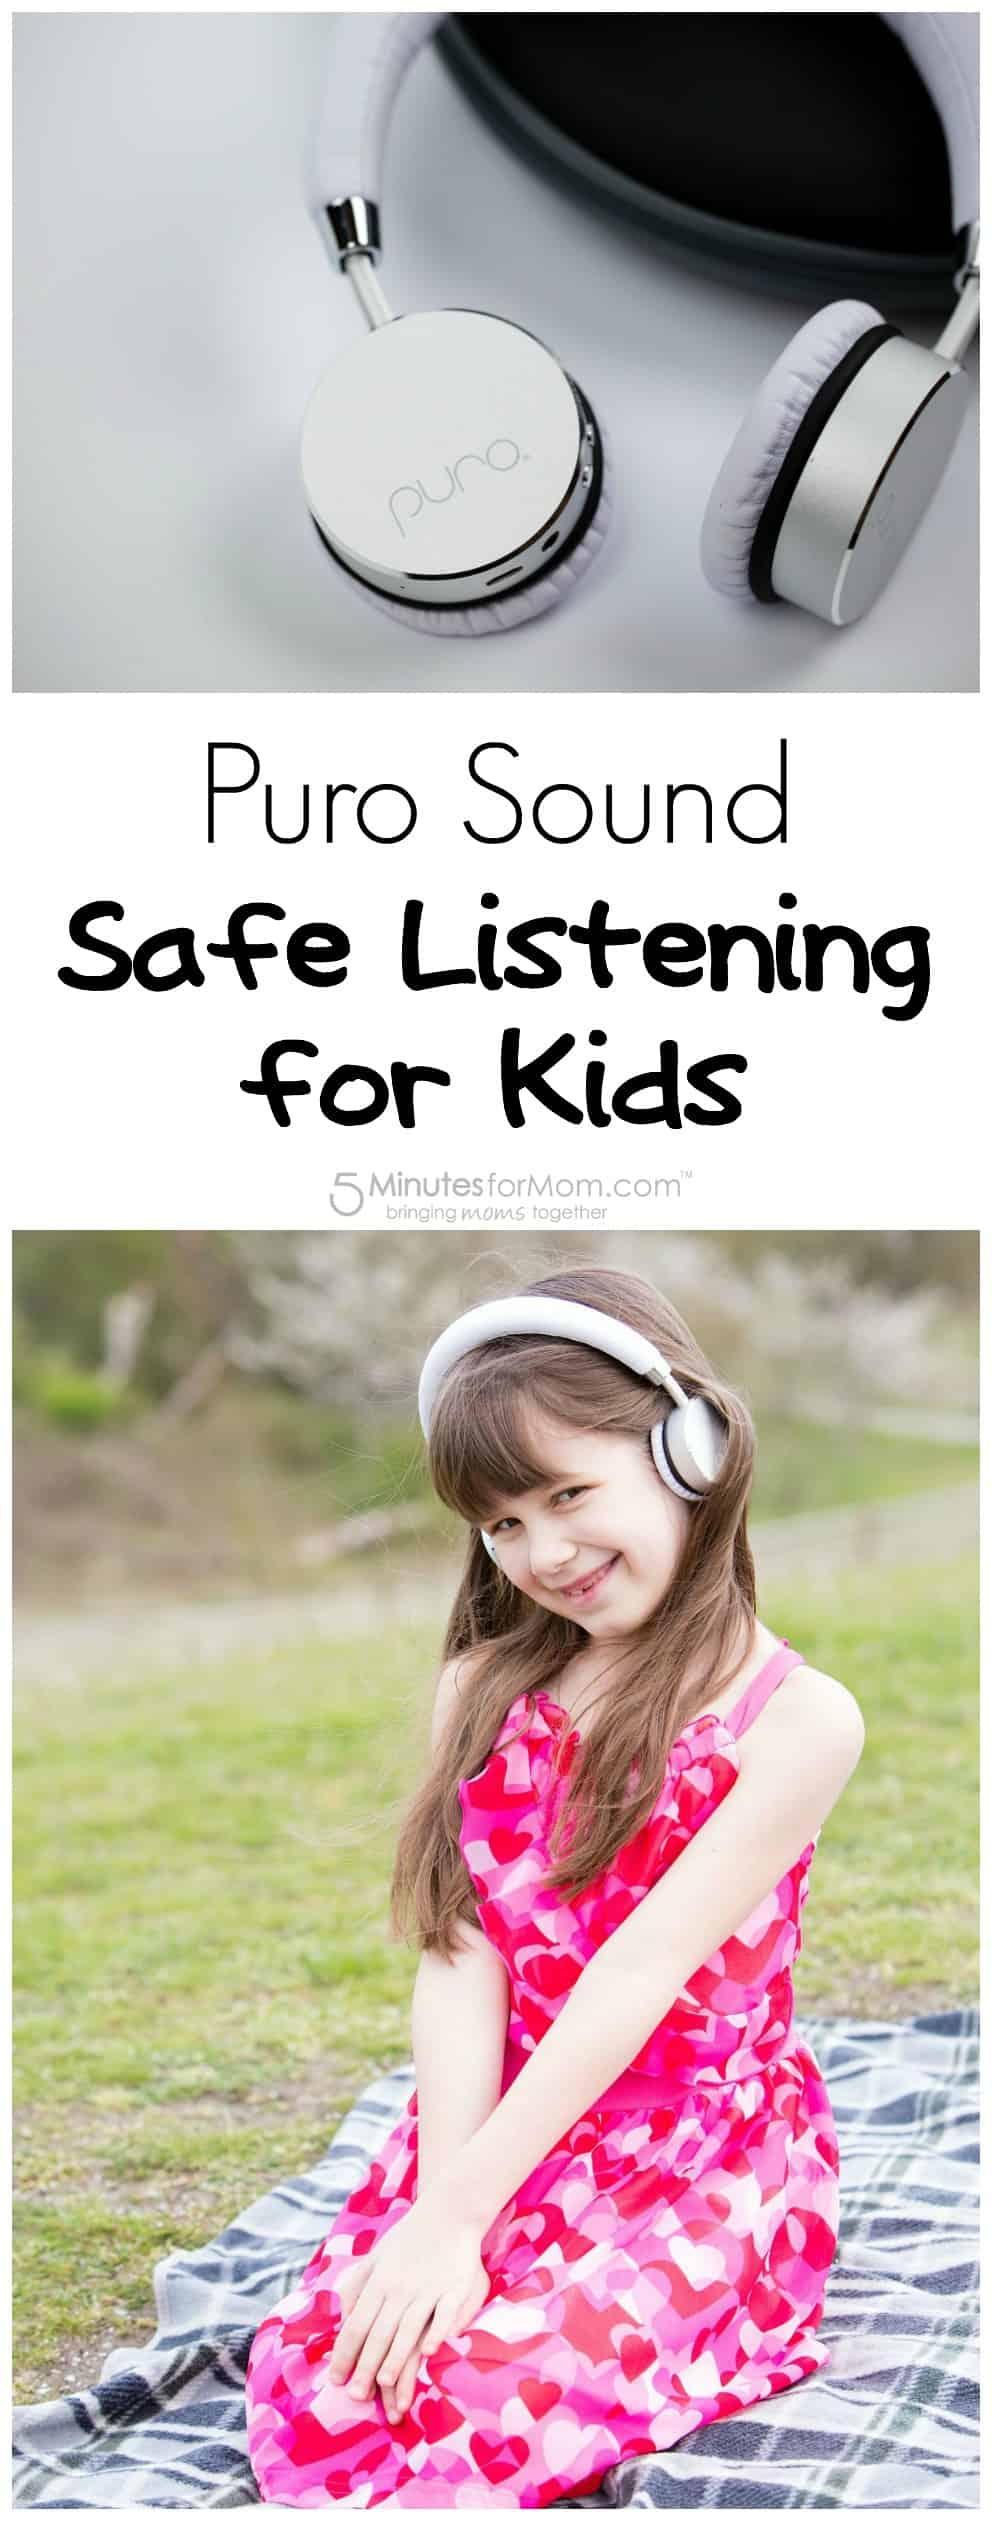 Puro Sound Headphones - Safe Listening for Kids